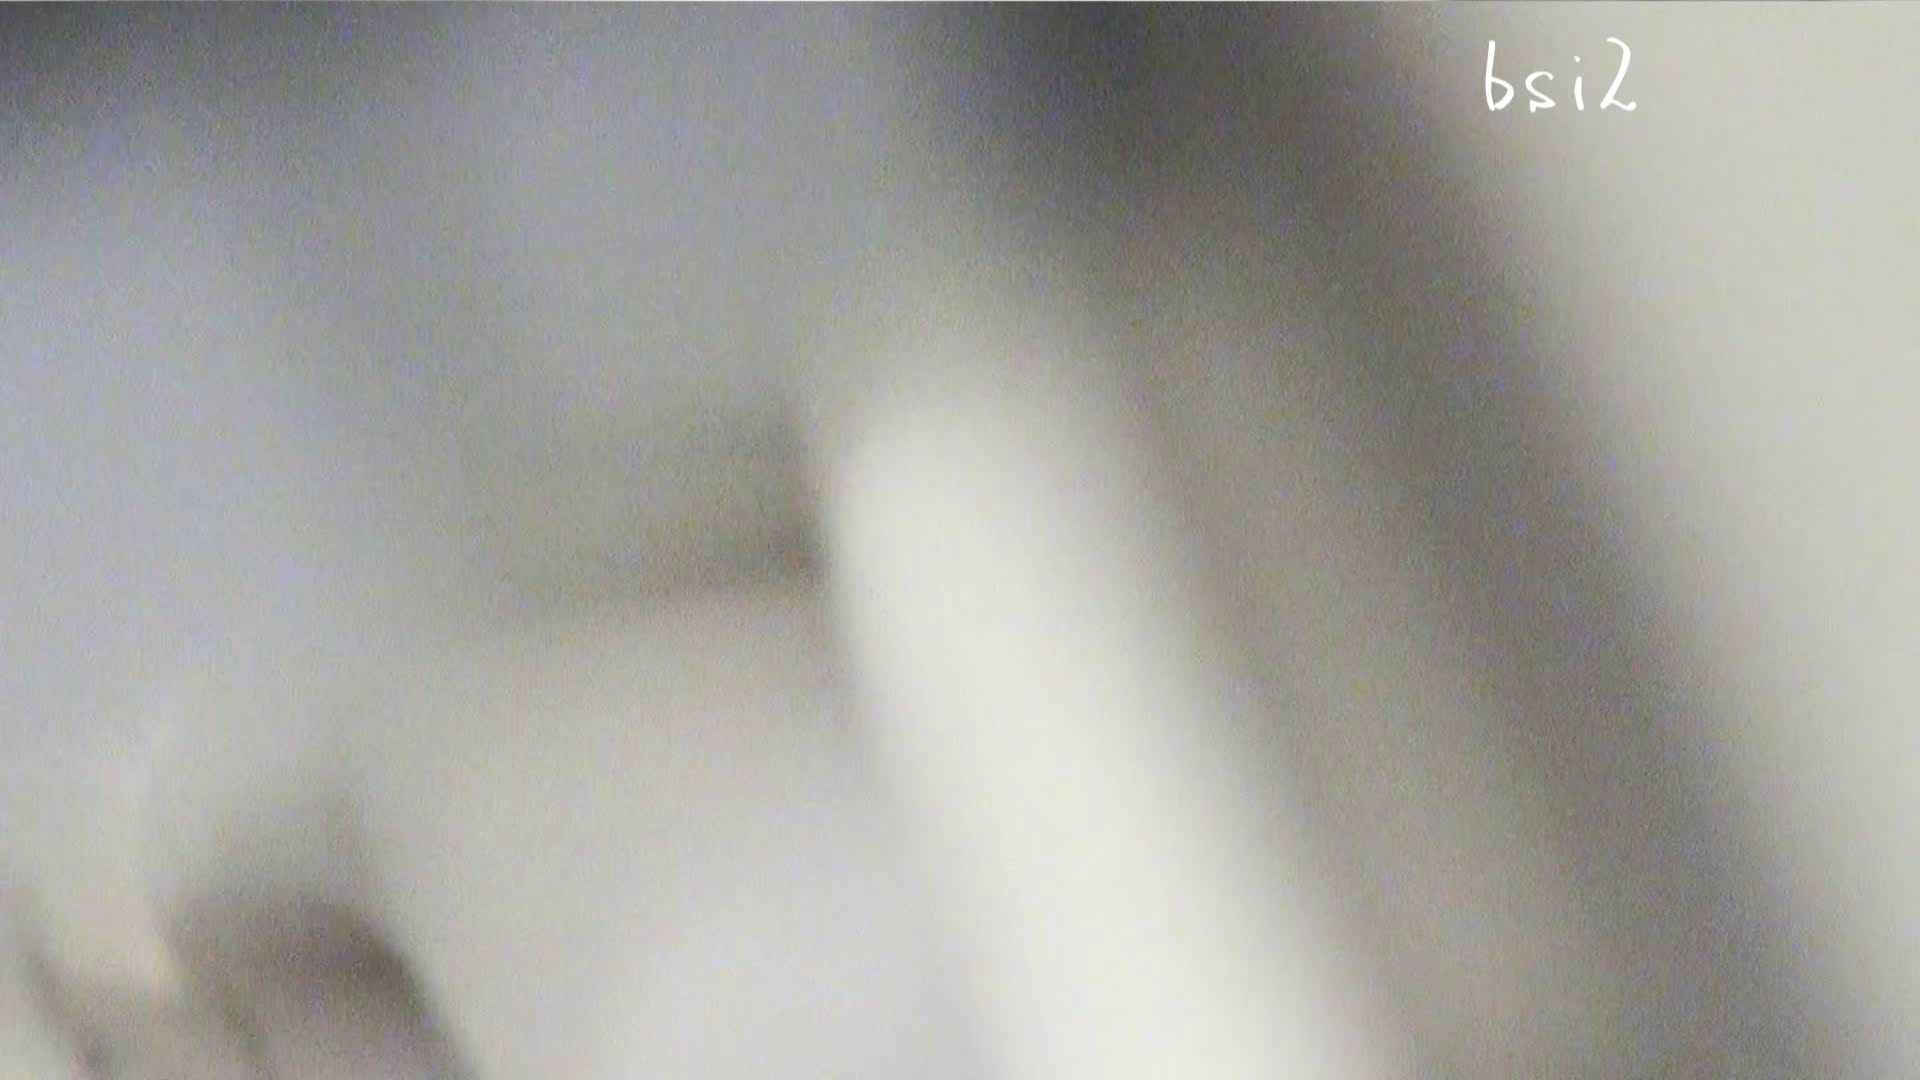 無修正エロ動画|至高下半身盗撮-PREMIUM-【院内病棟編 】VOL2|怪盗ジョーカー